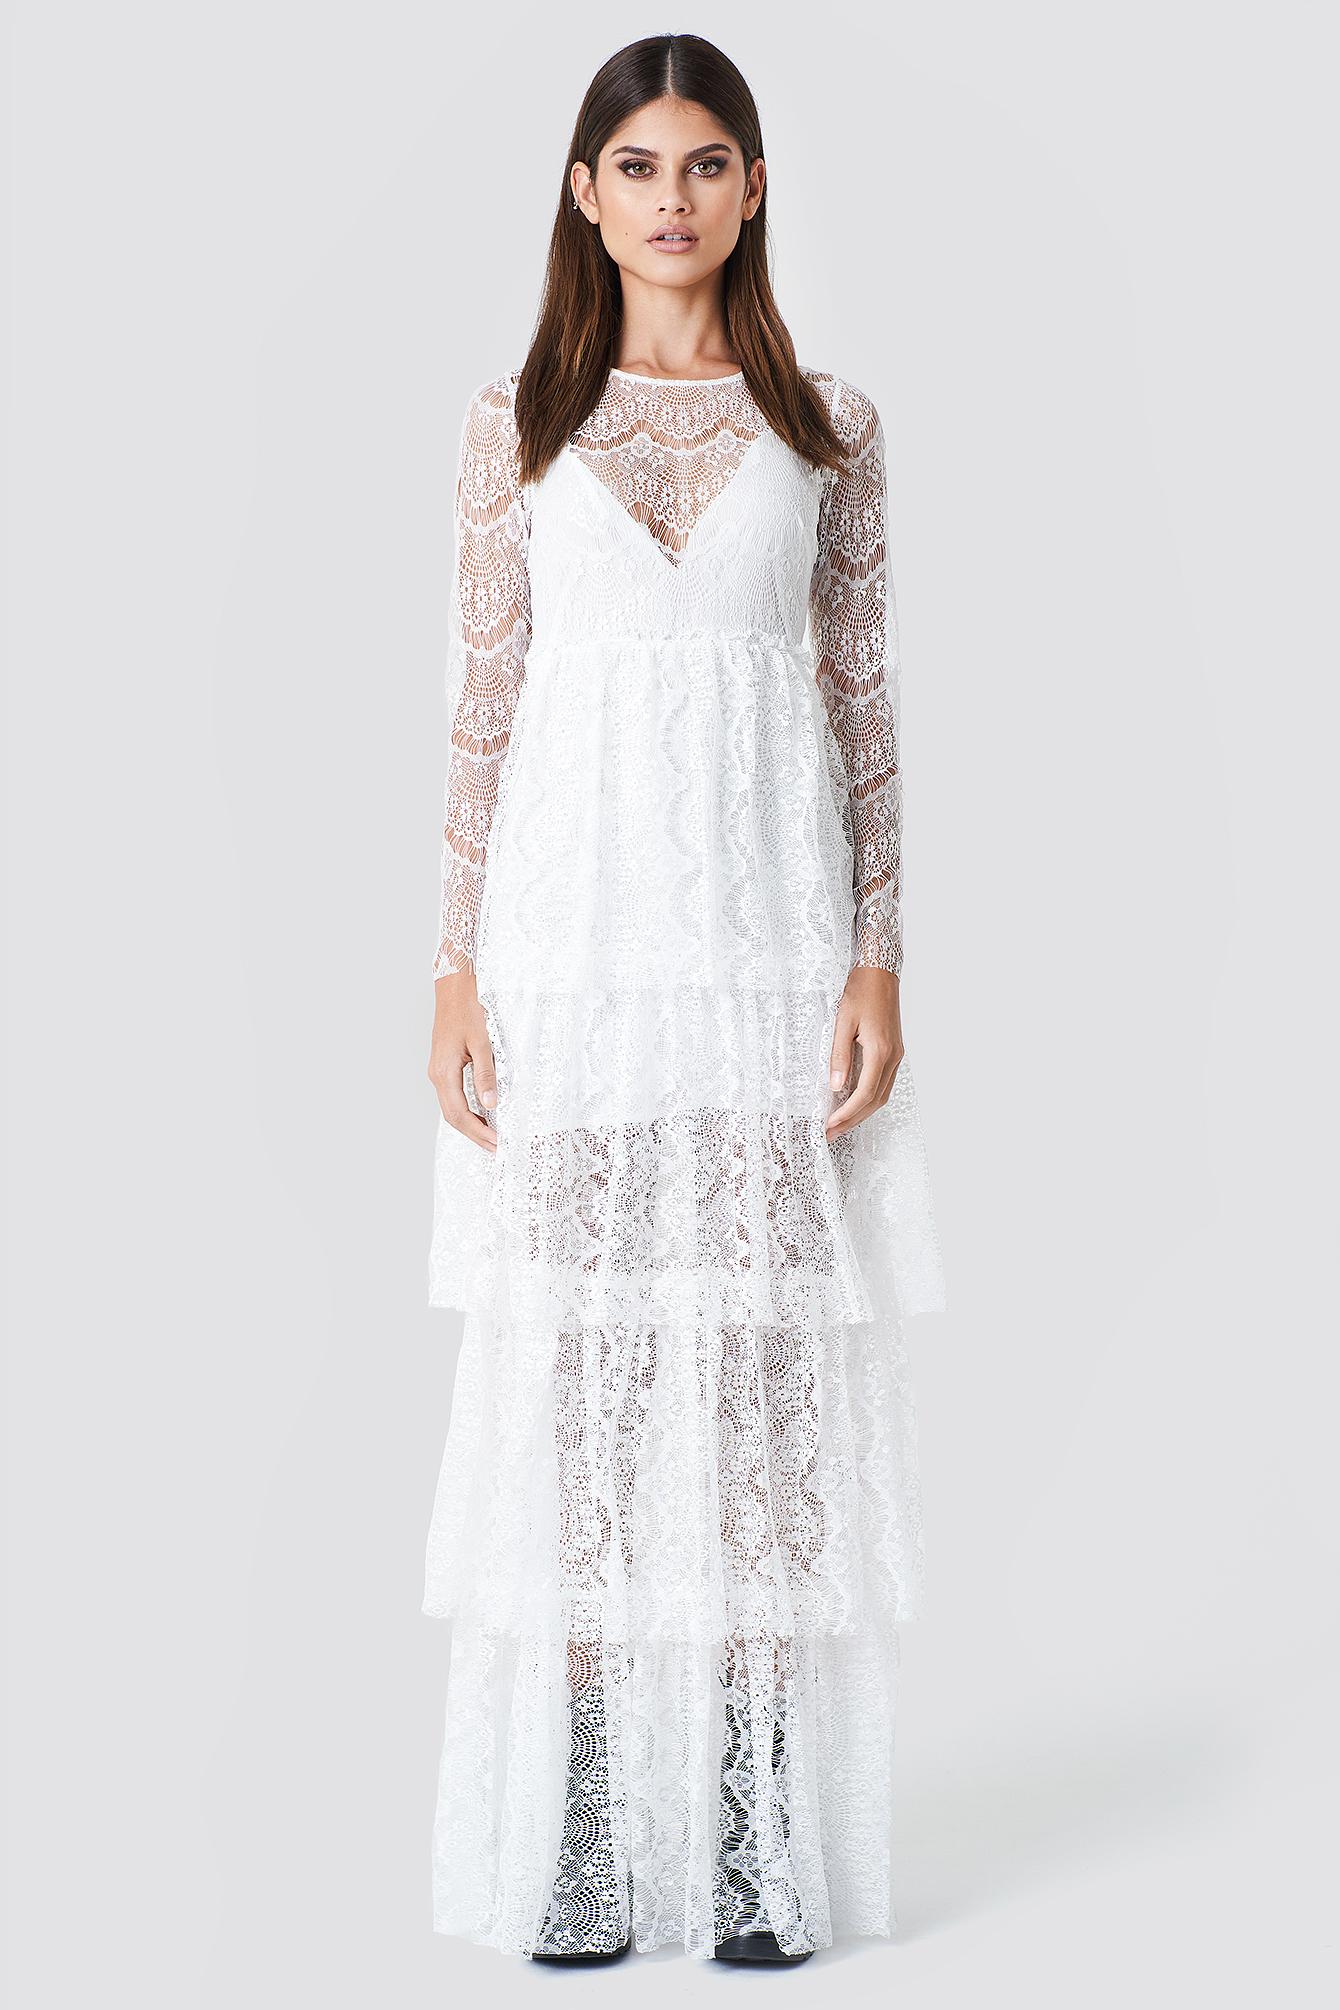 SAHARA RAY X NA-KD Long Sleeve Lace Dress - White